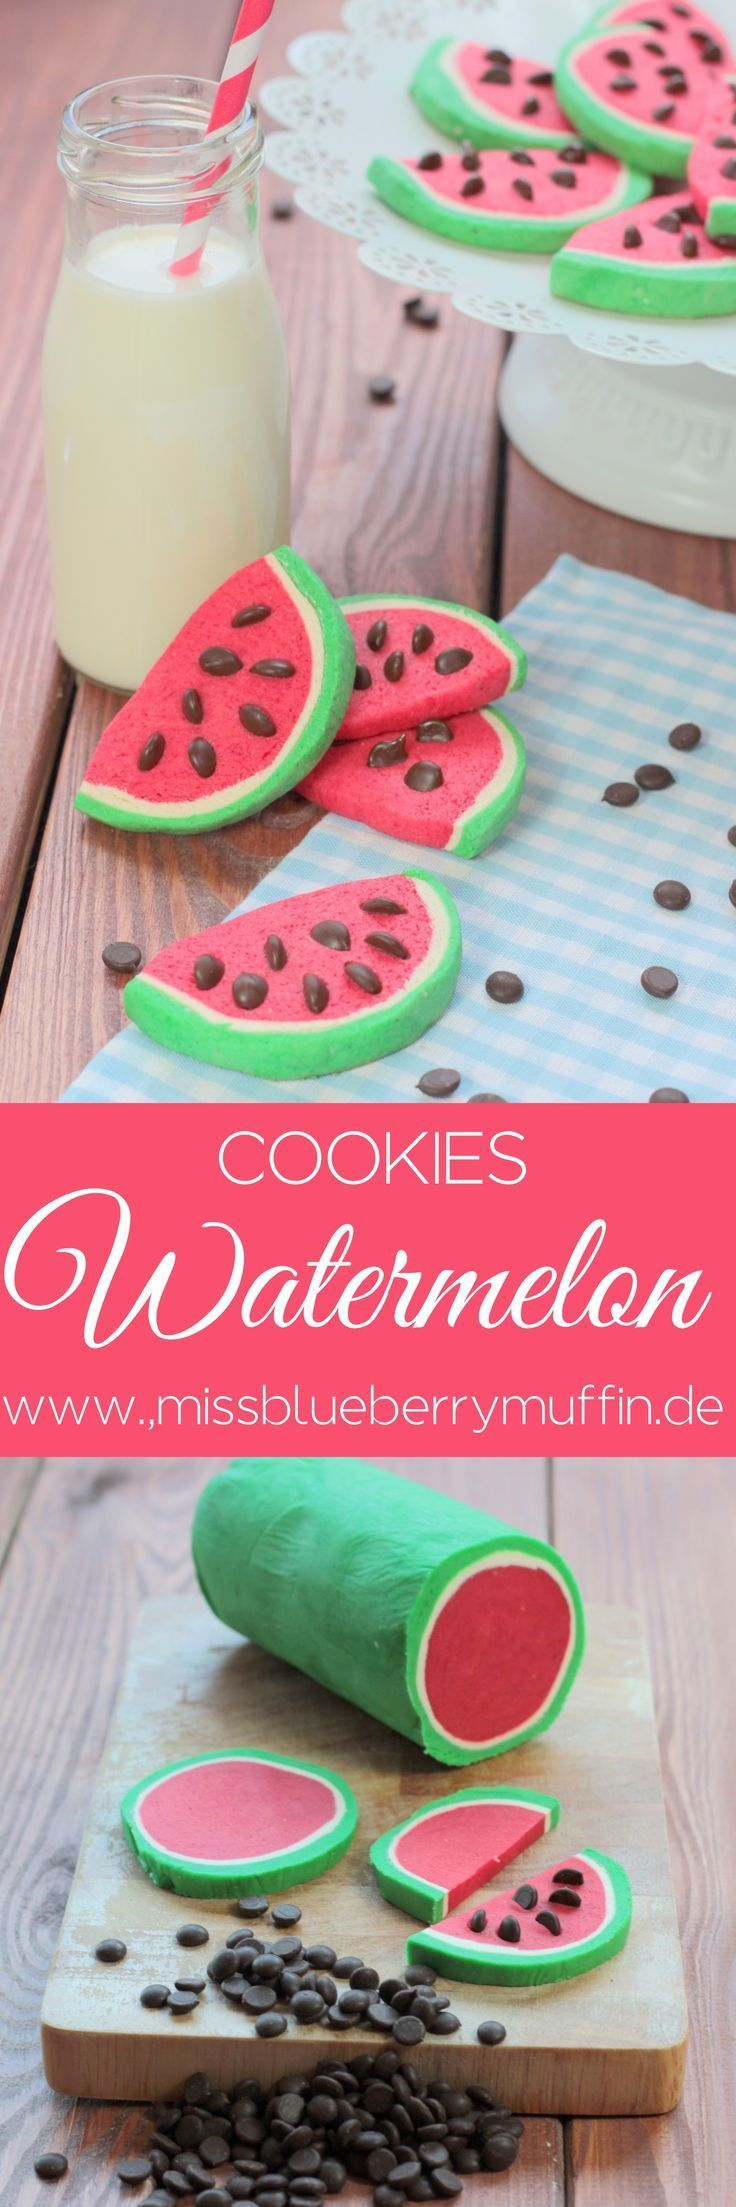 Sweet watermelon cookies  Cute watermelon cookies    Sweet watermelon cookies  Cute watermelon cookies